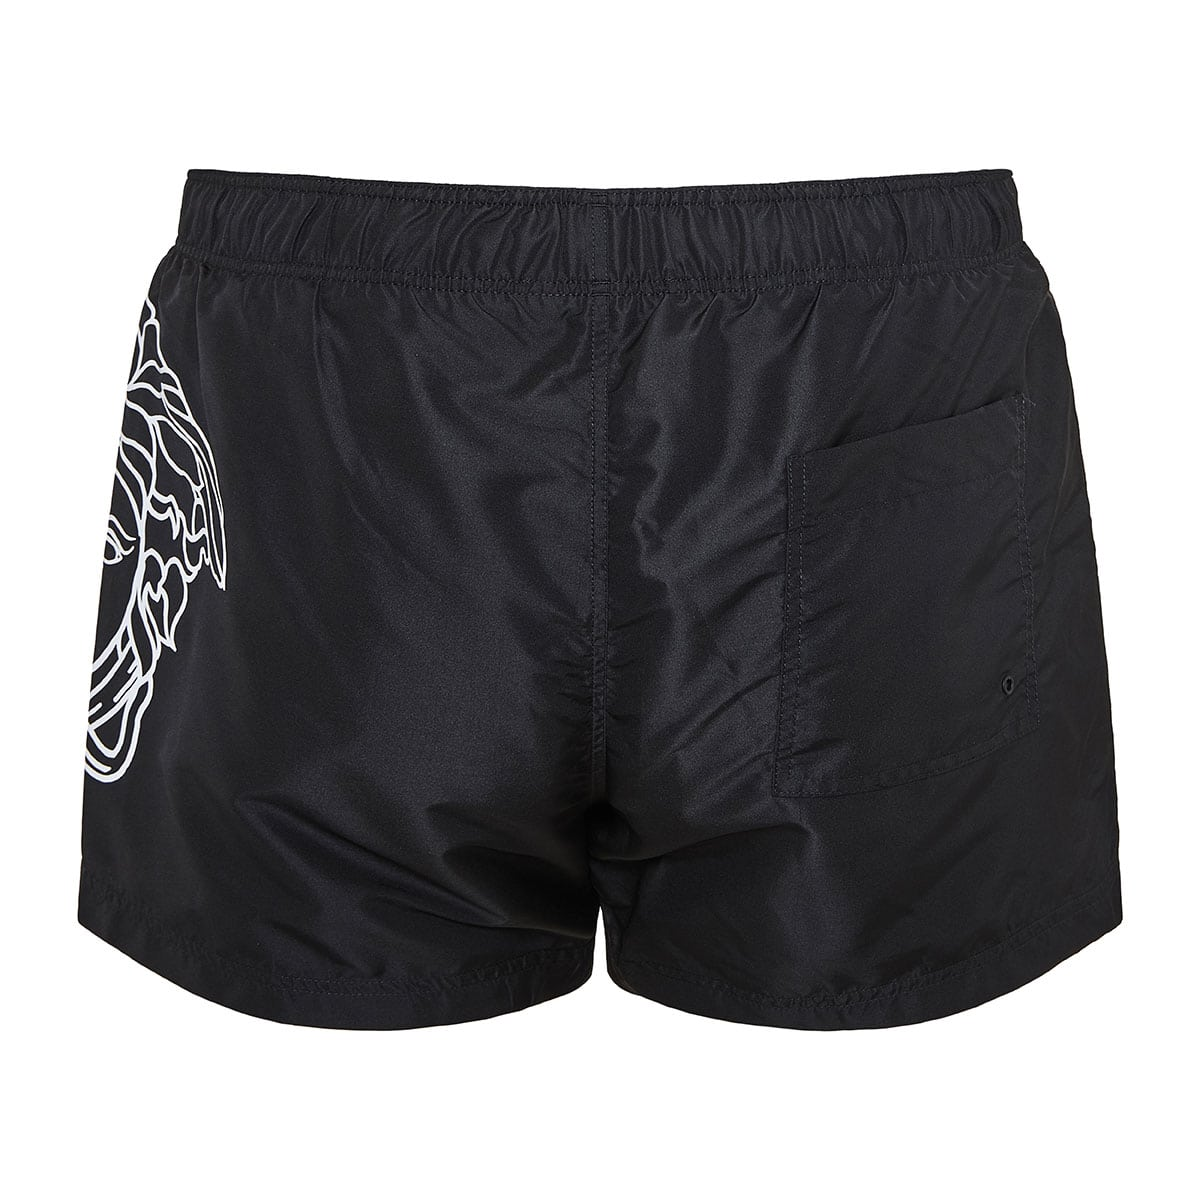 Medusa swim shorts